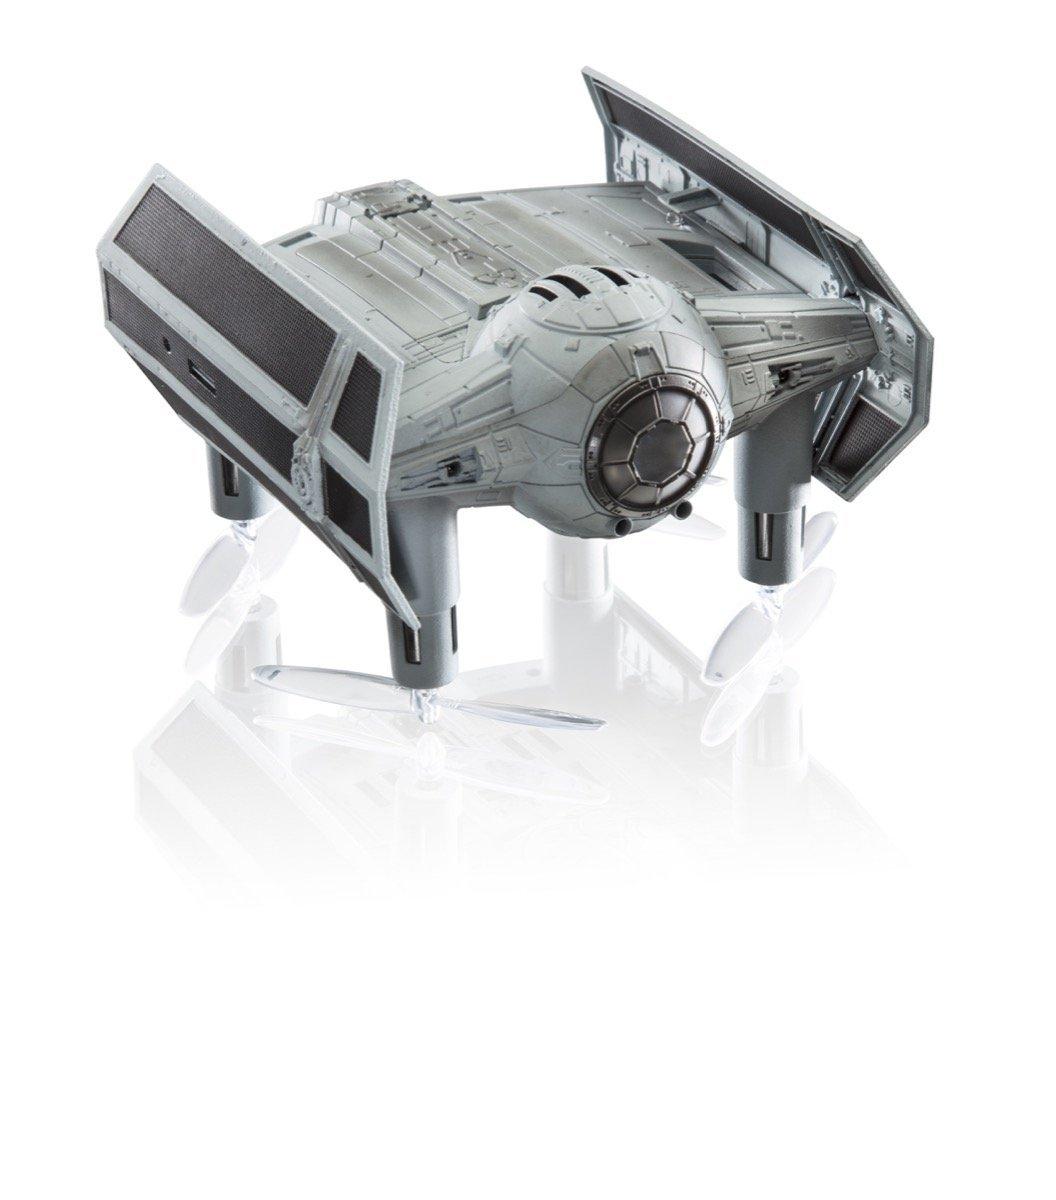 Drone Propel TIE Advanced X1 Star Wars